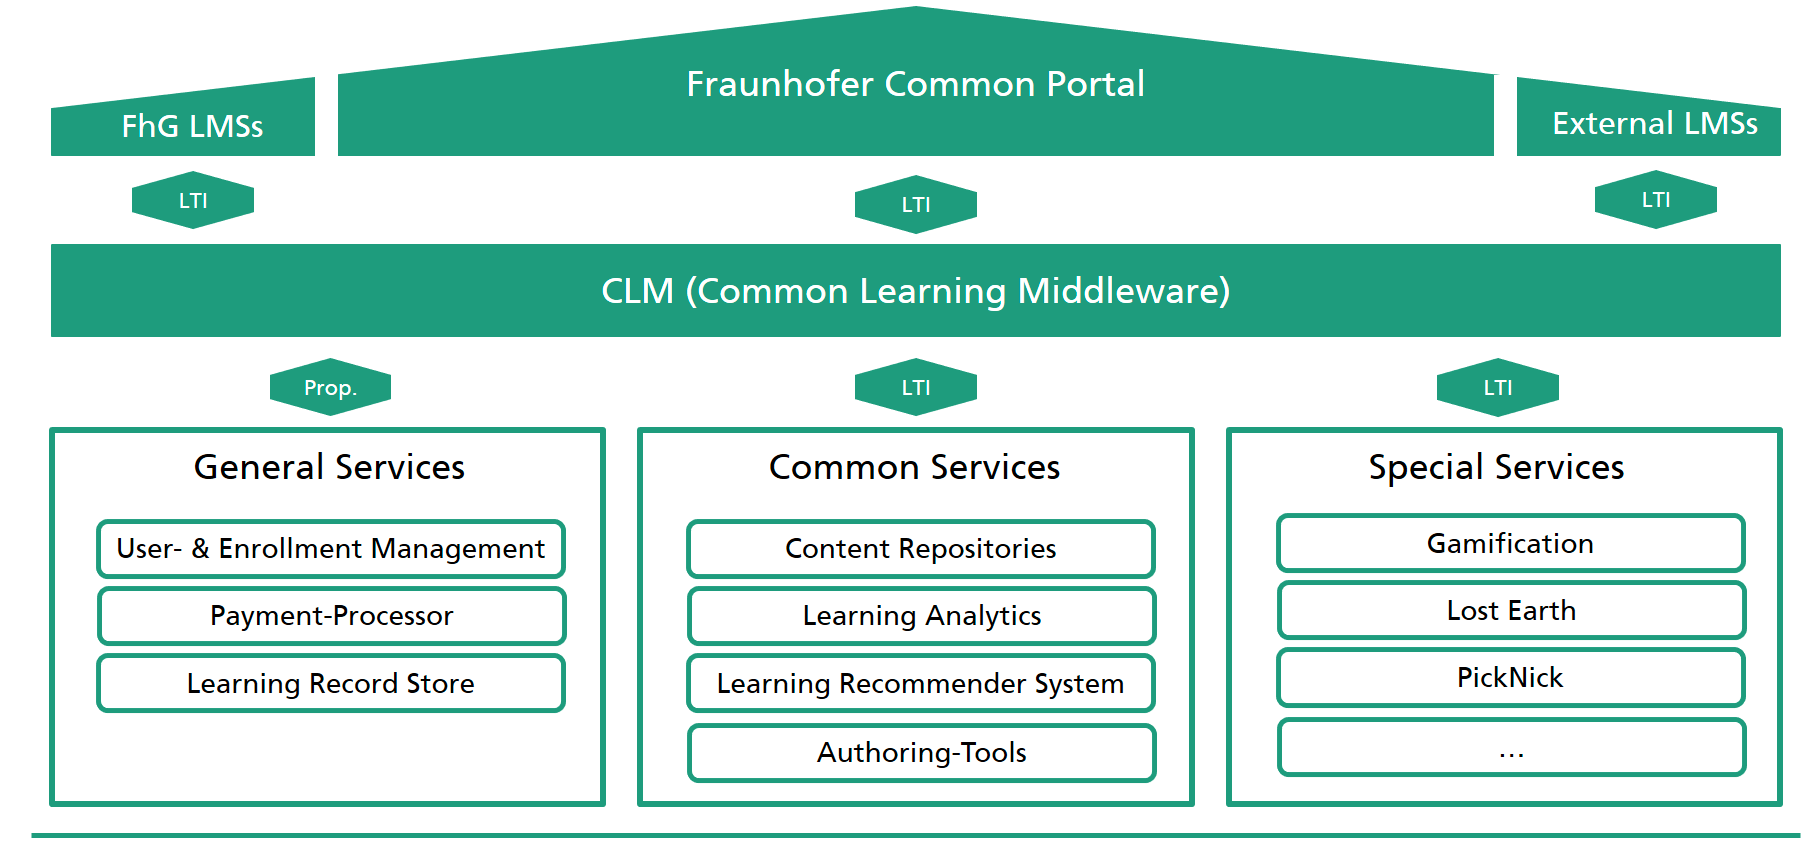 fame projekt clm services grafik